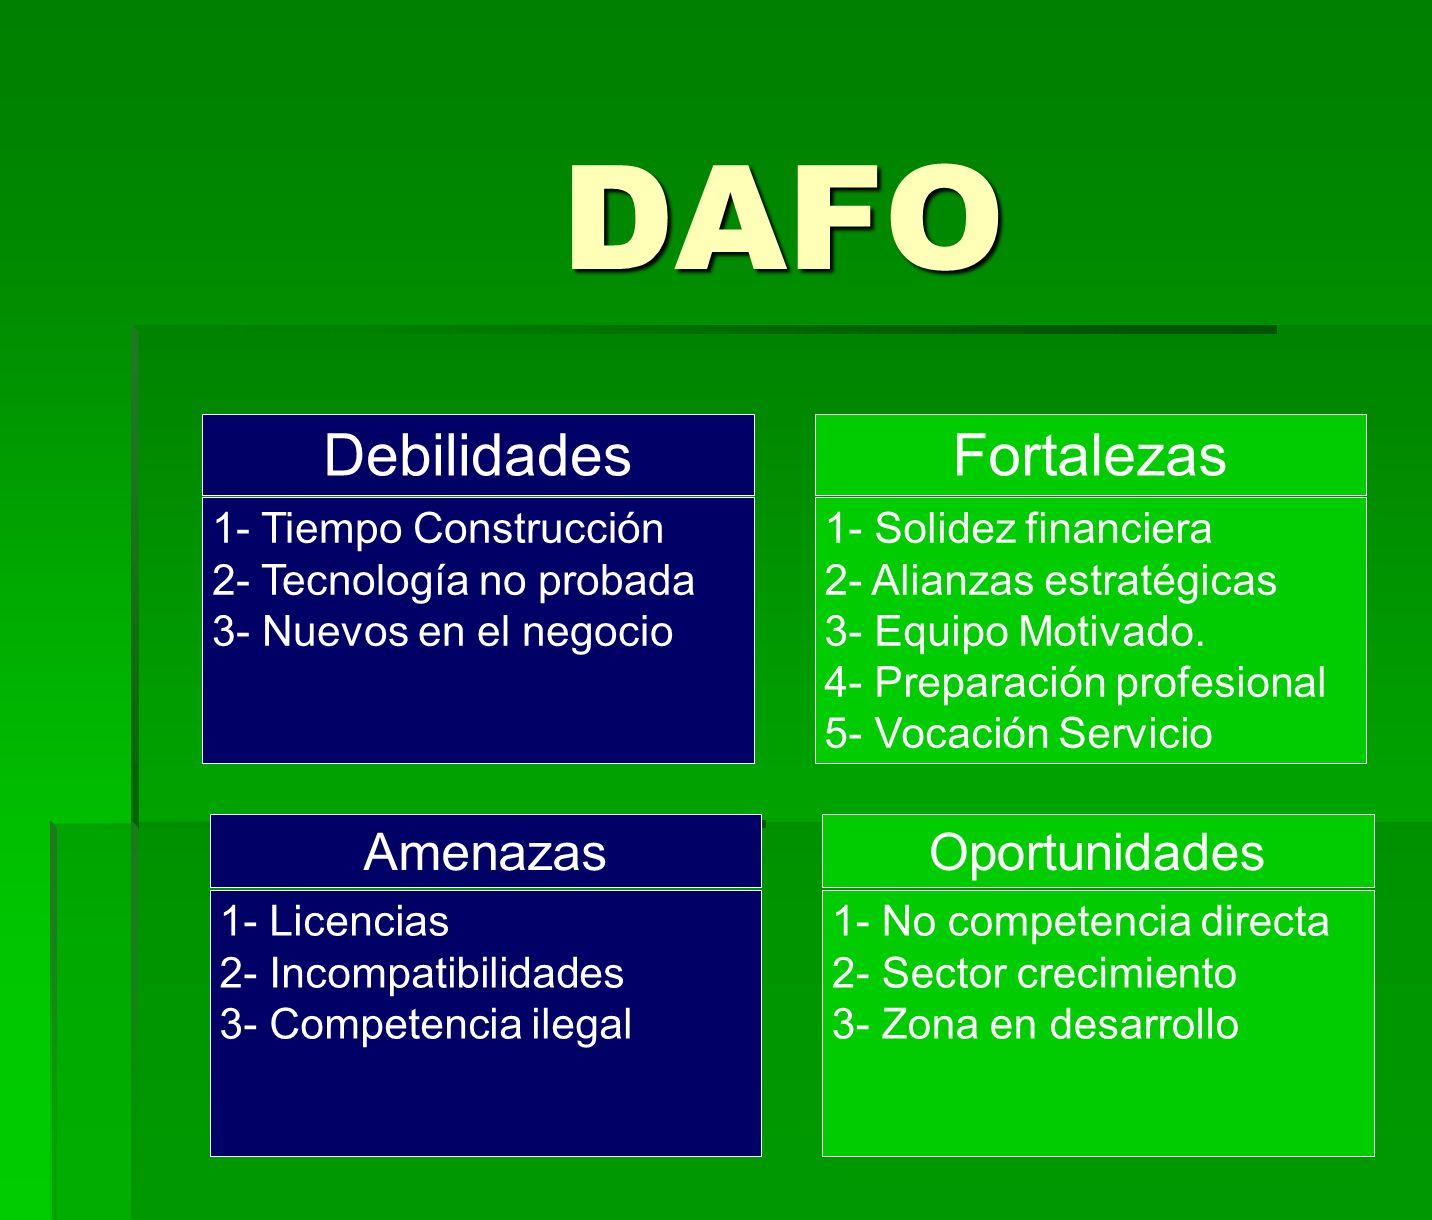 DAFO Debilidades Fortalezas Amenazas Oportunidades